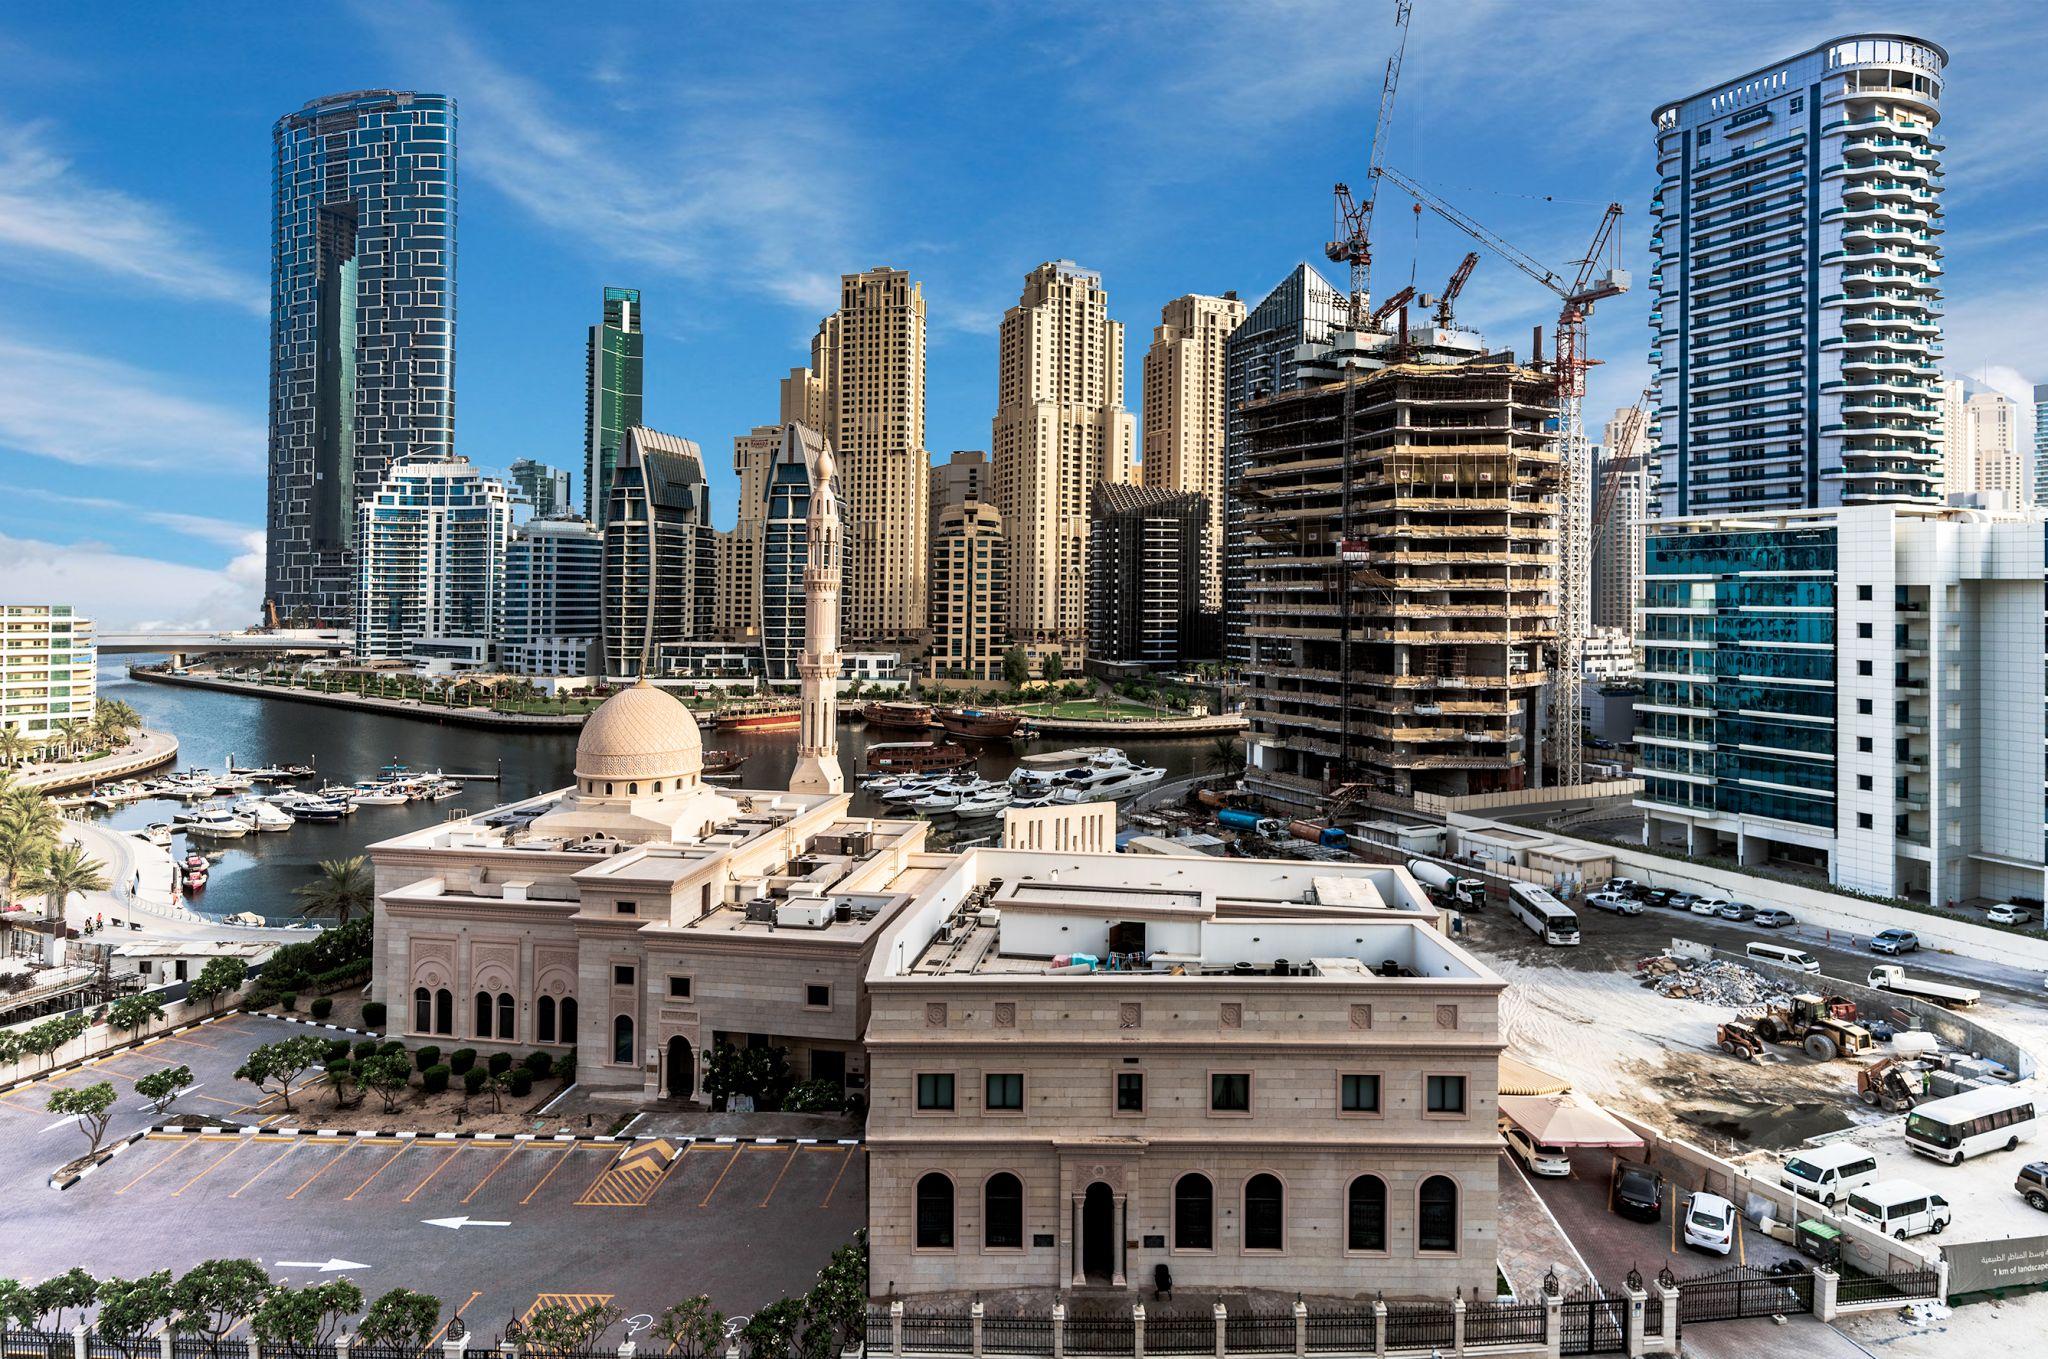 Dubai Marina View, United Arab Emirates